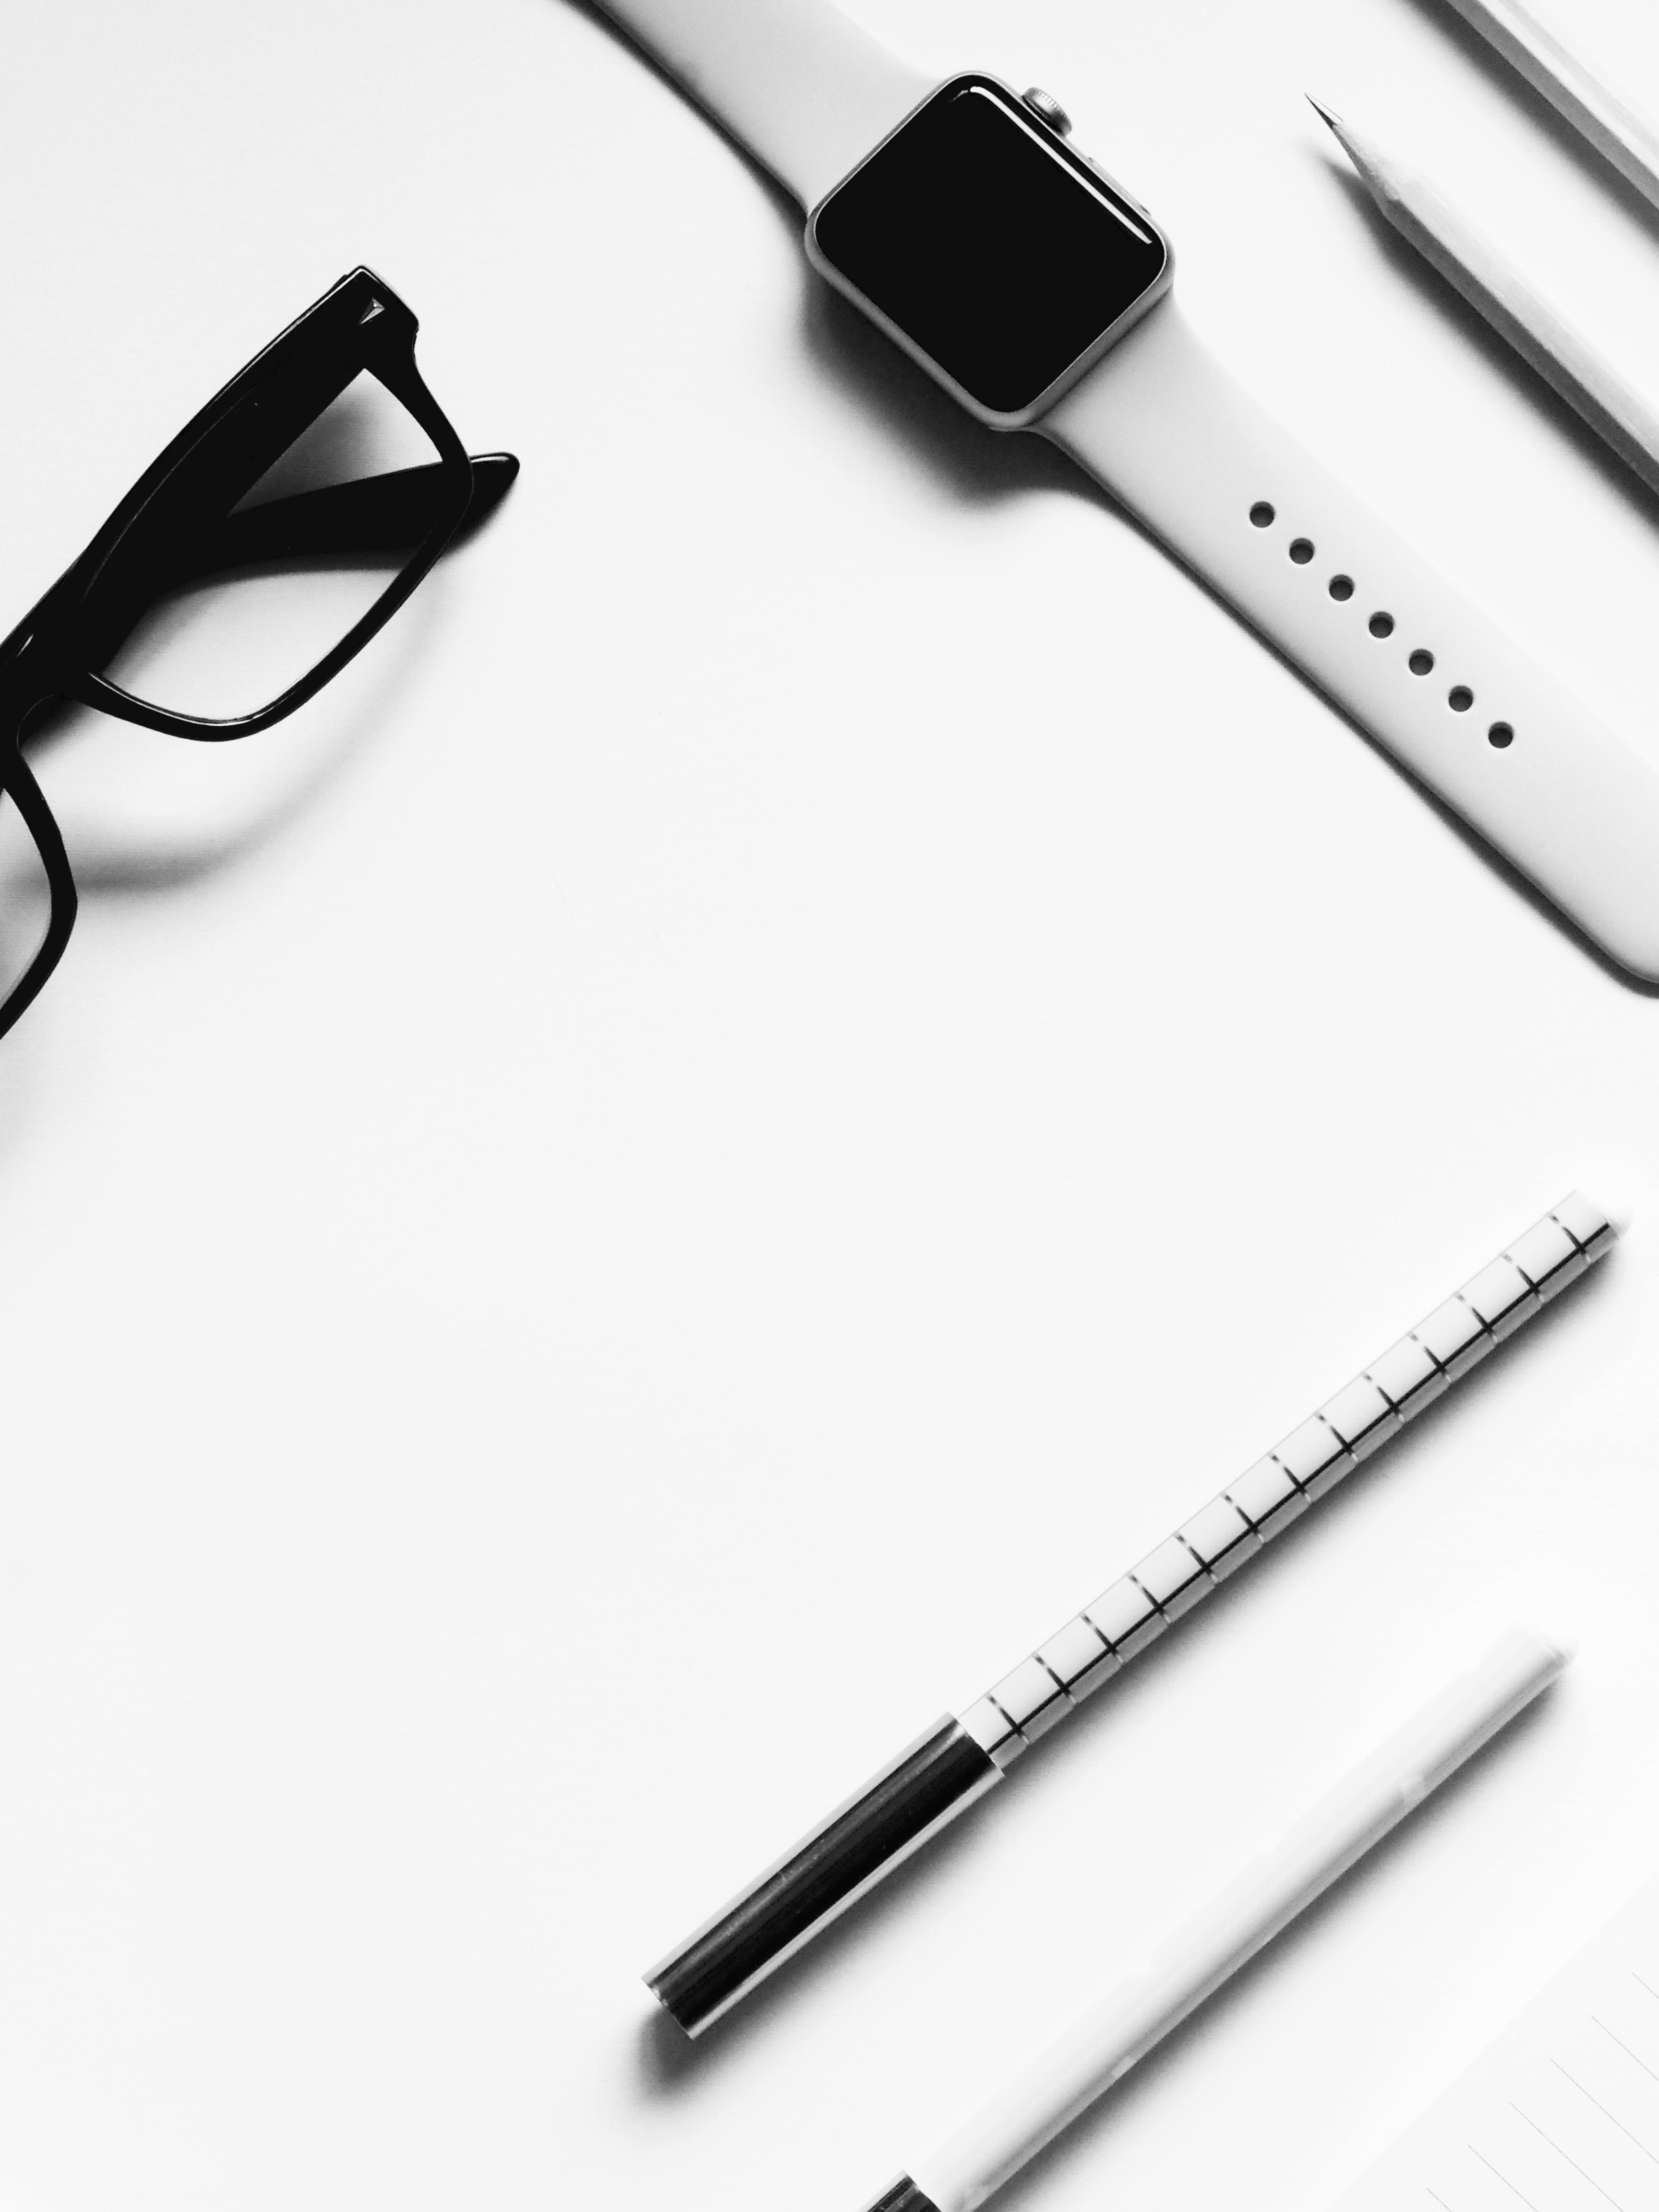 eyeglasses on white surface